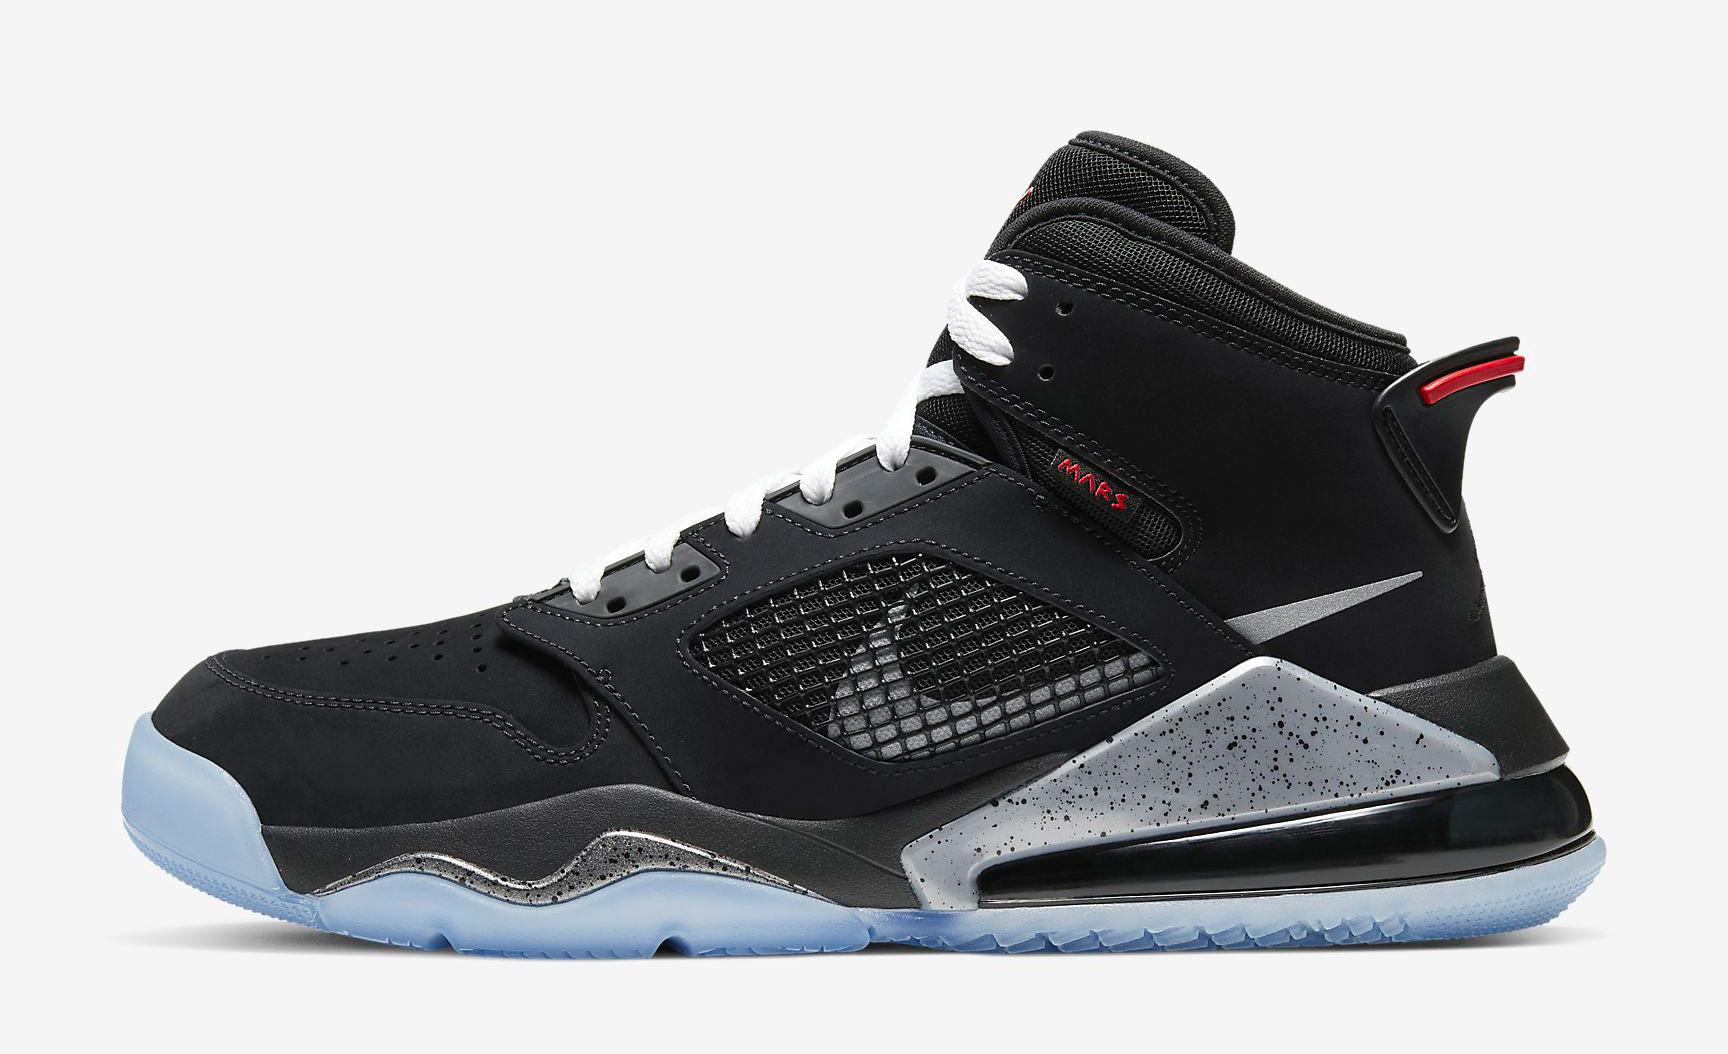 jordan-mars-270-black-cement-release-date